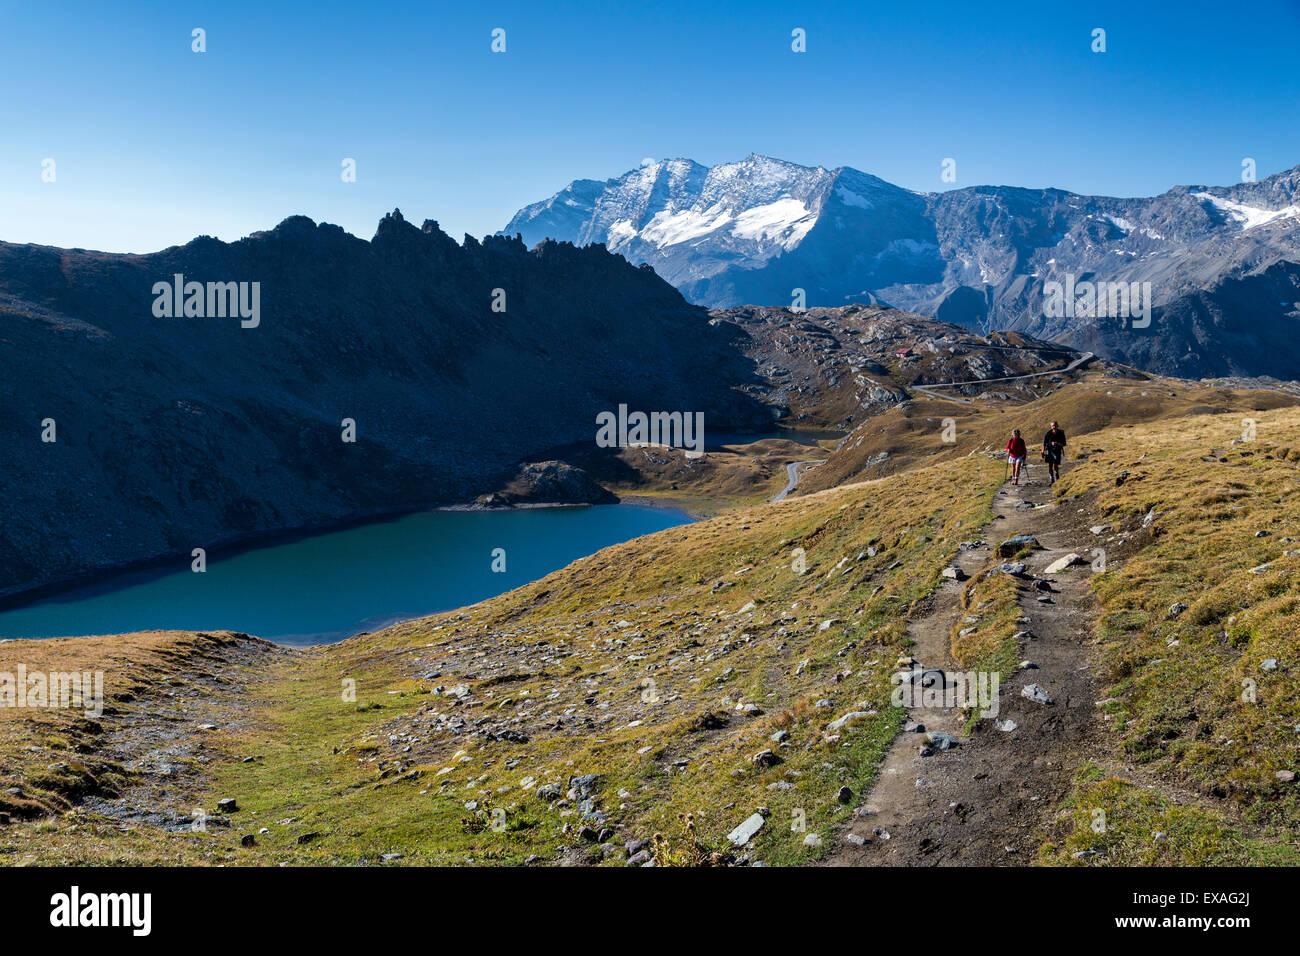 Hikers walking on the Colle del Nivolet beside Rossett Lake, Gran Paradiso National Park, Alpi Graie (Graian Alps), - Stock Image